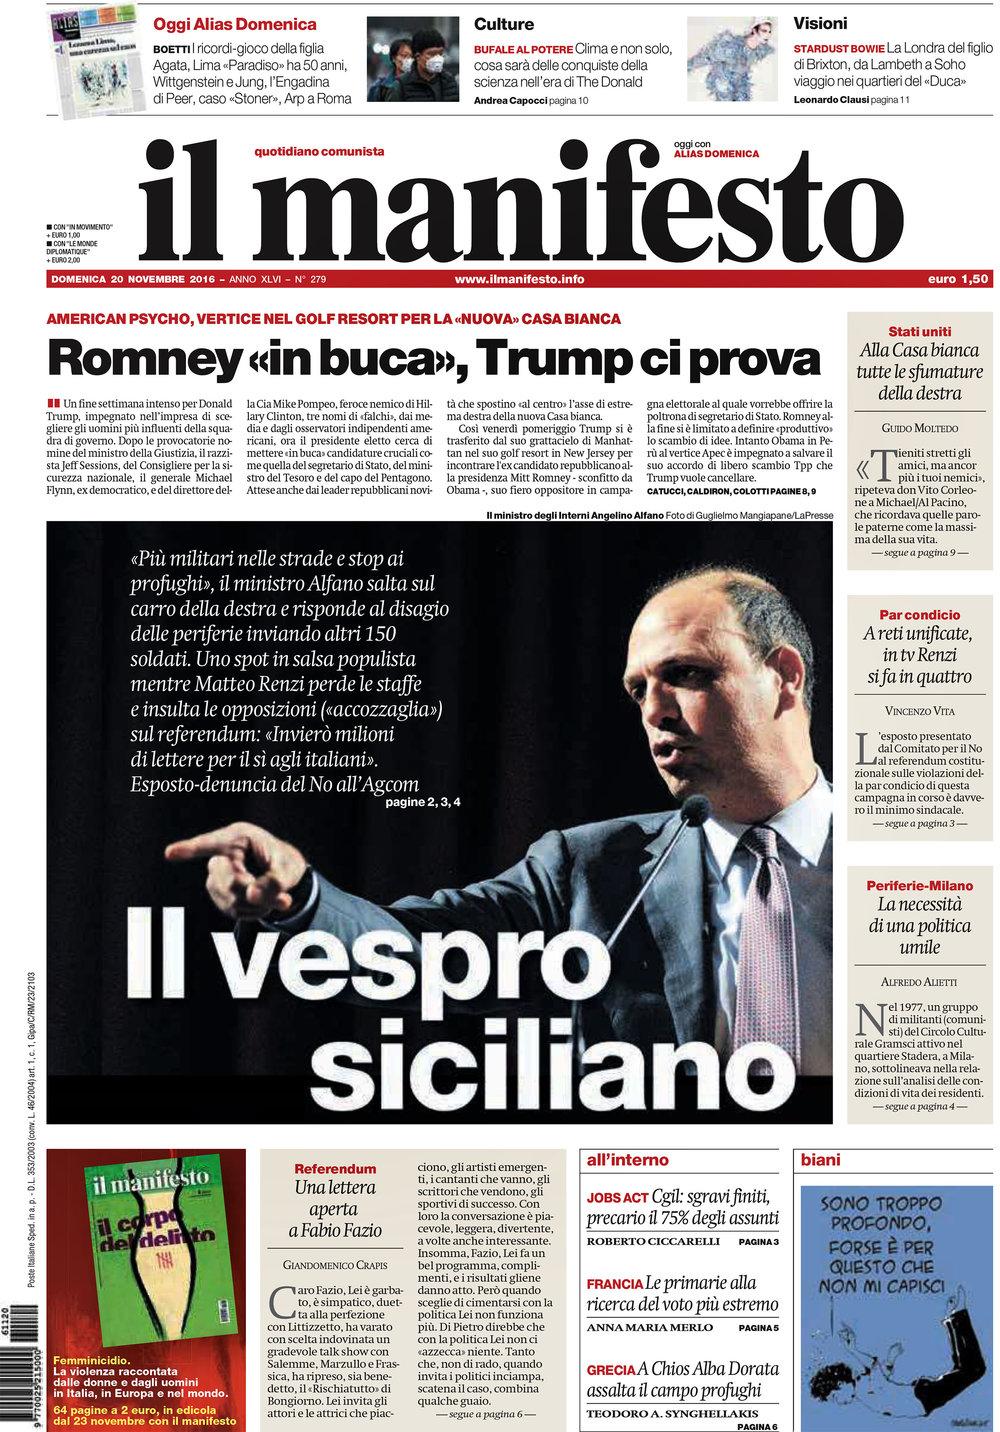 Il Manifesto — November 20, 2016